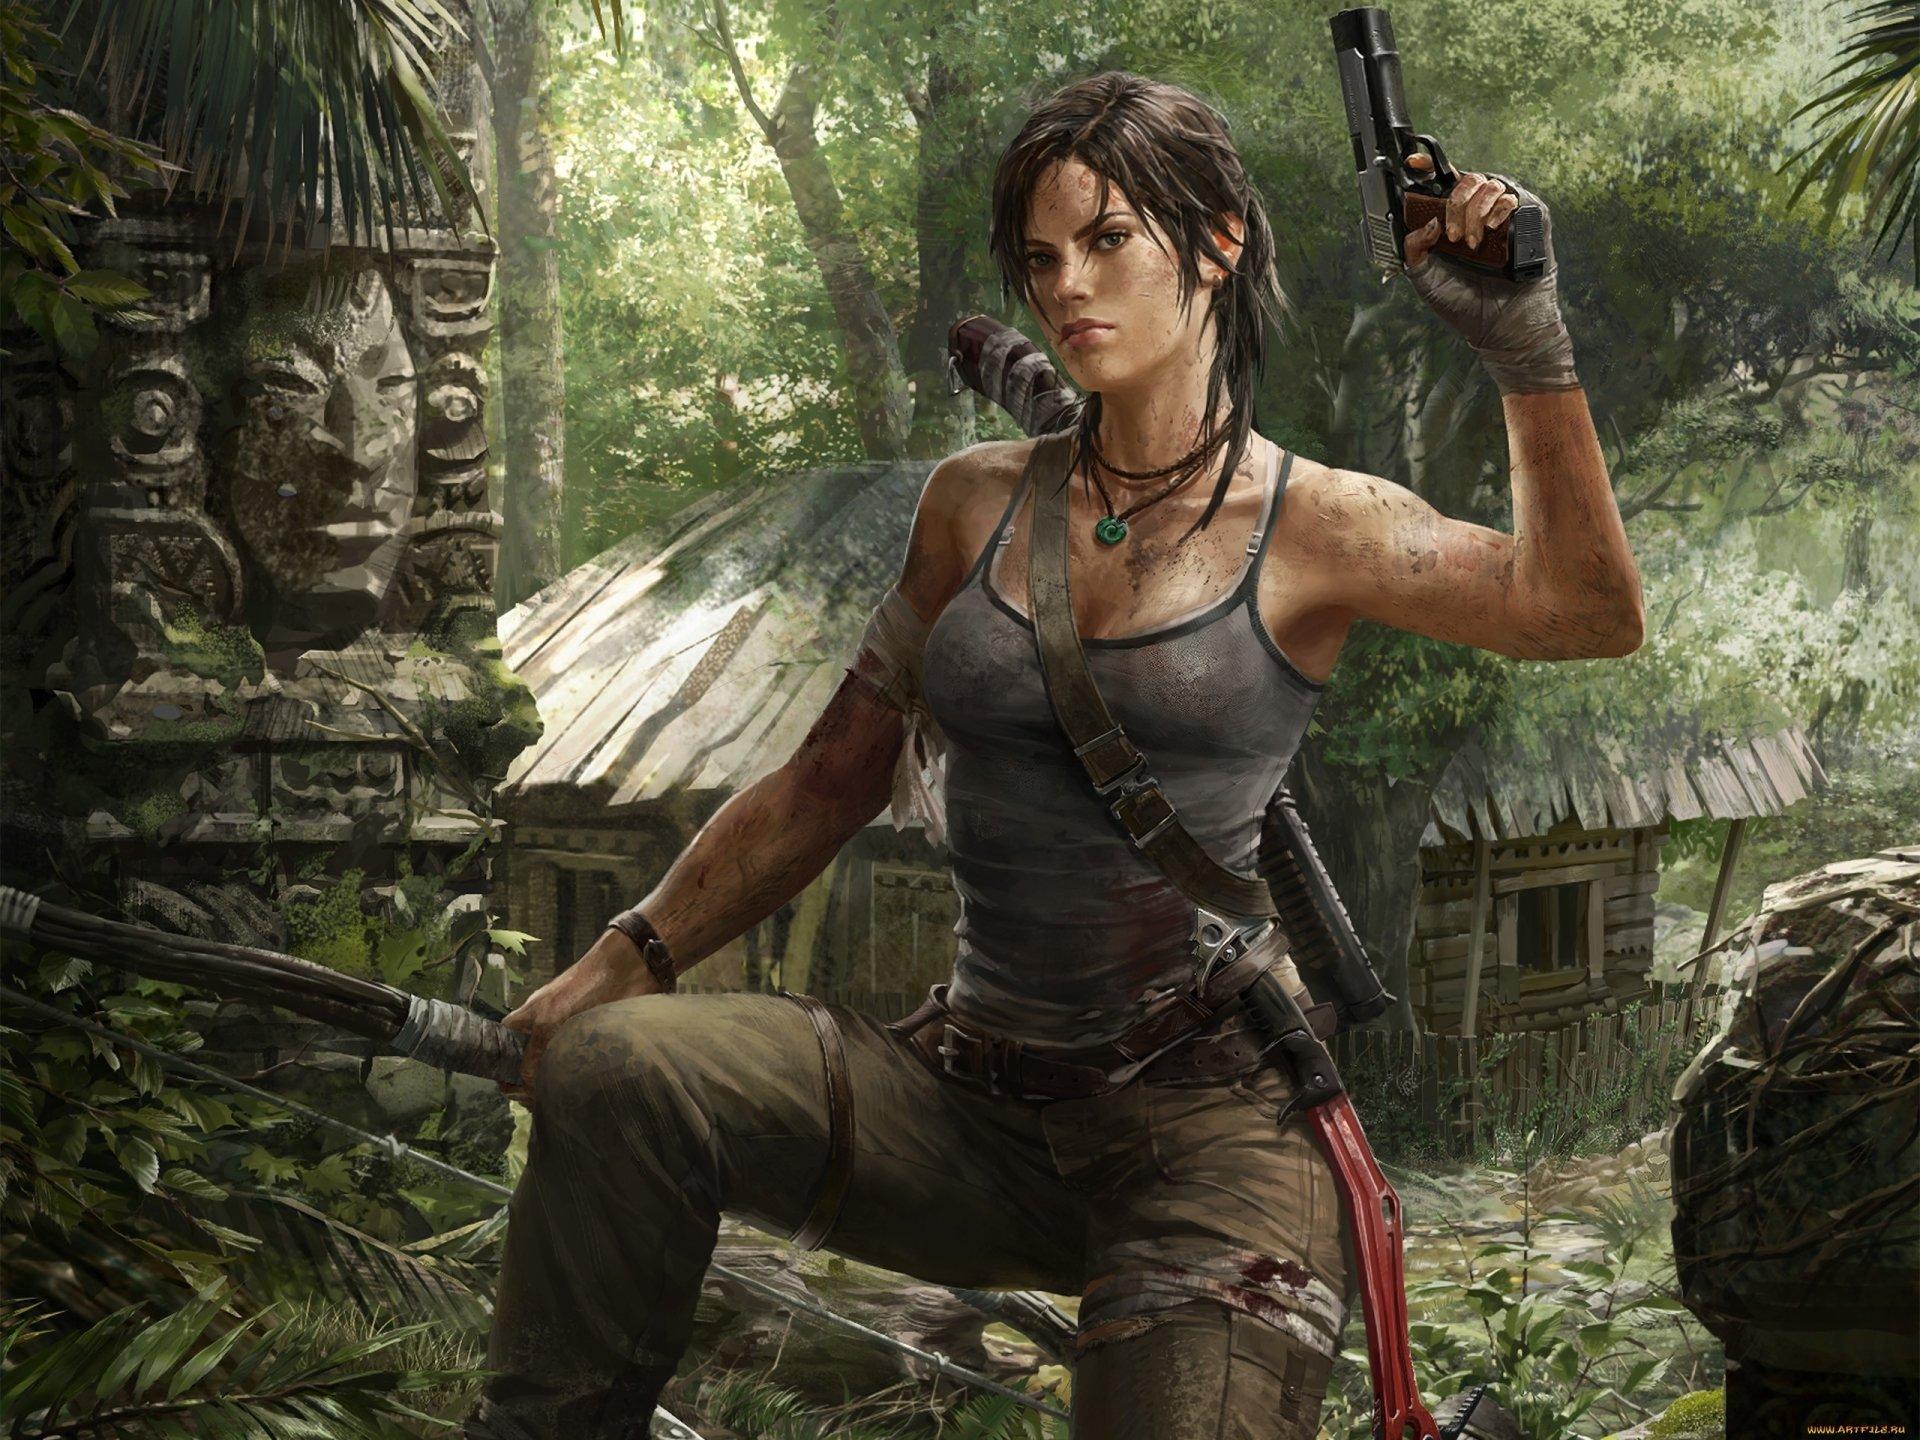 thumb-1920-420710.jpg - Tomb Raider (2013)